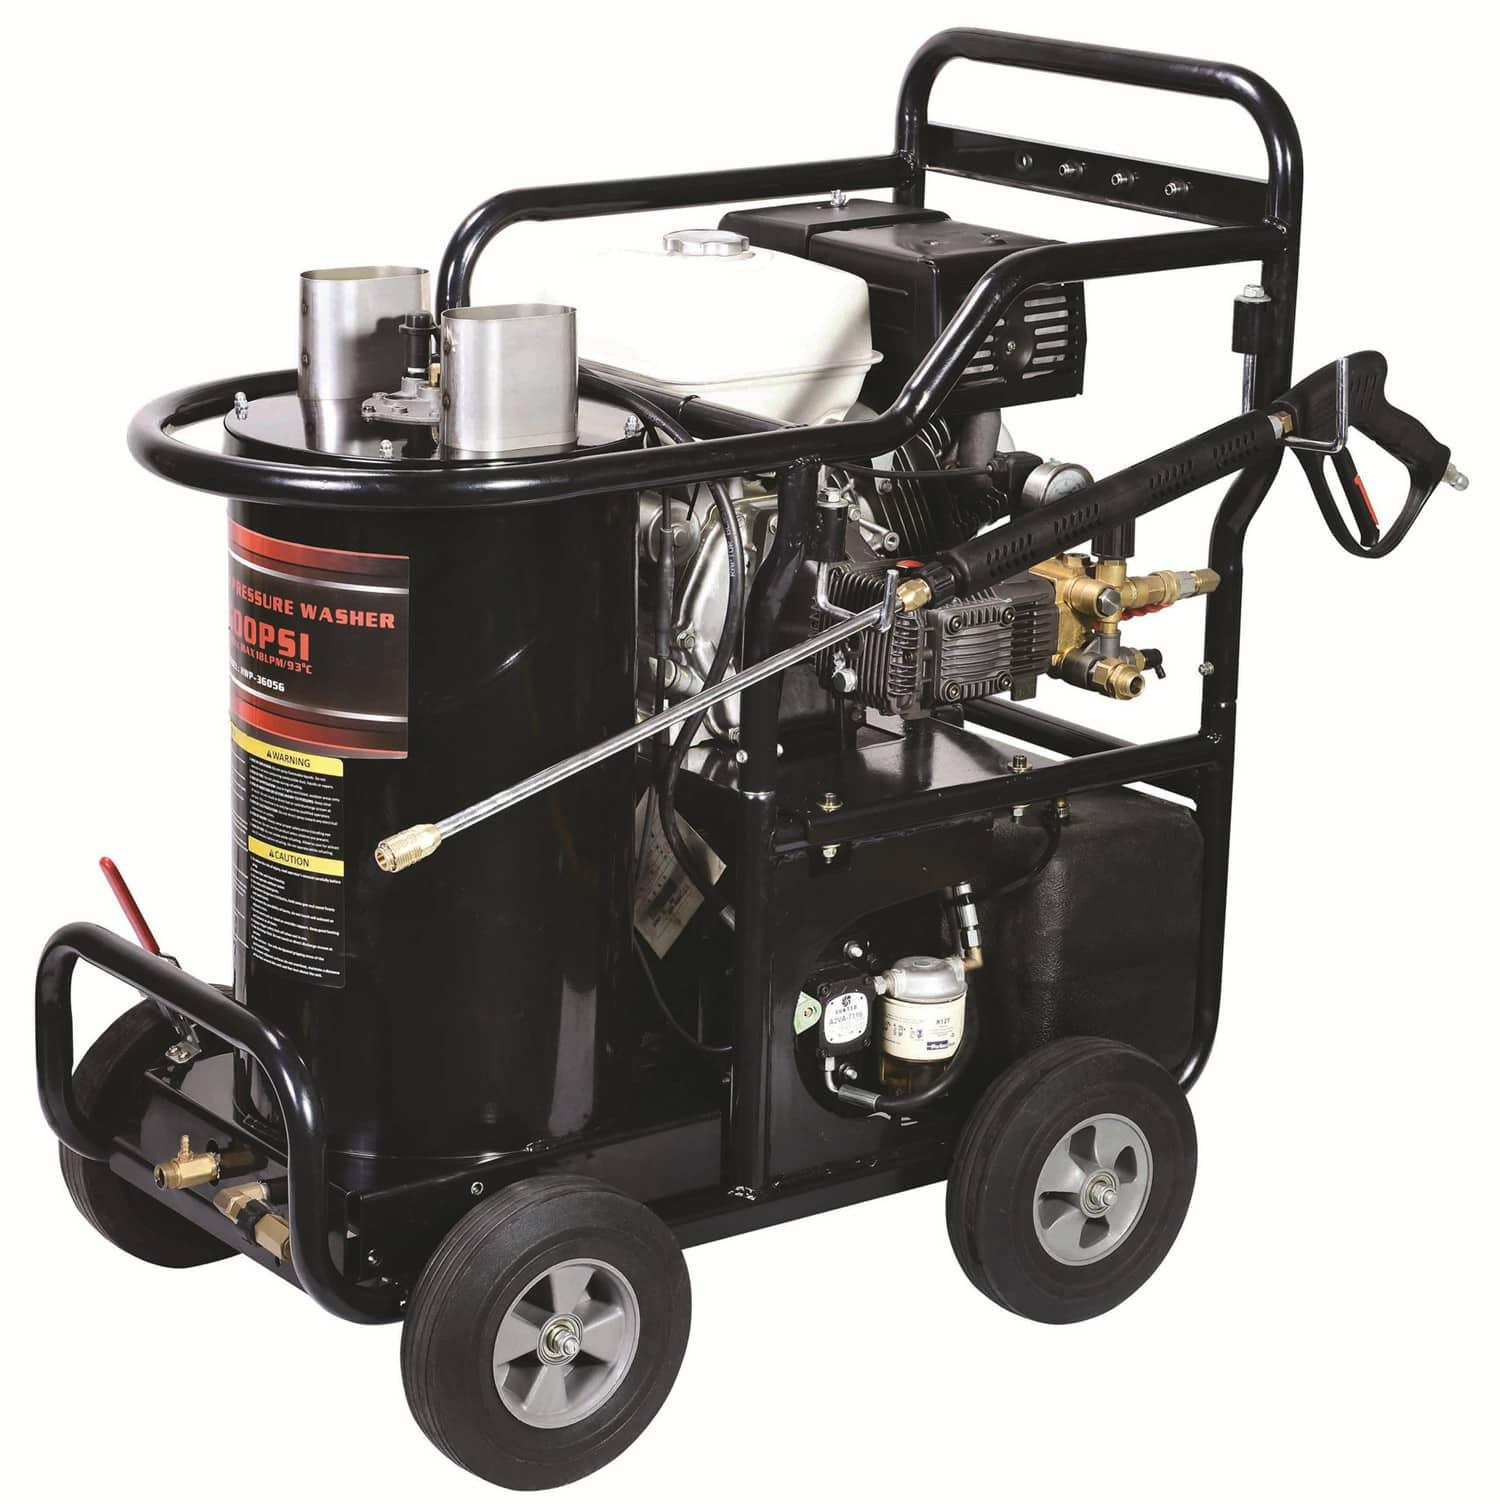 Professional Gas.Diesel Hot Water Pressure Washer